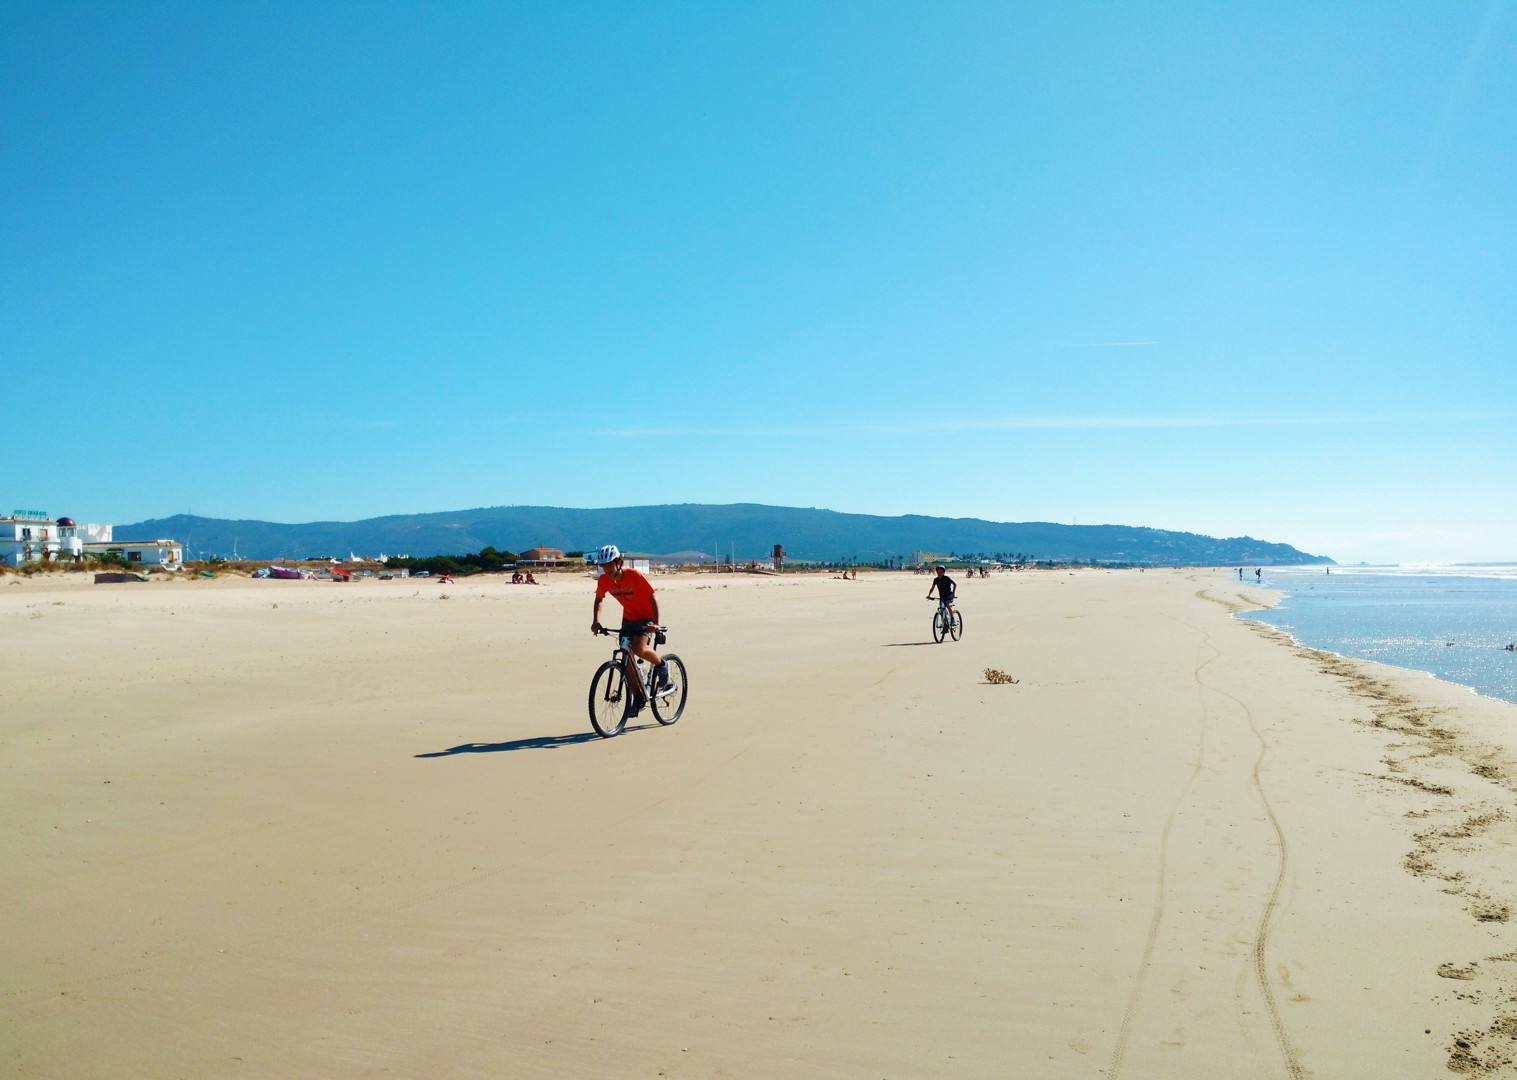 coastal-bike-ride-holiday-family-south-spain.jpg - Southern Spain - Coastal Adventurer - Self-Guided Family Cycling Holiday - Family Cycling